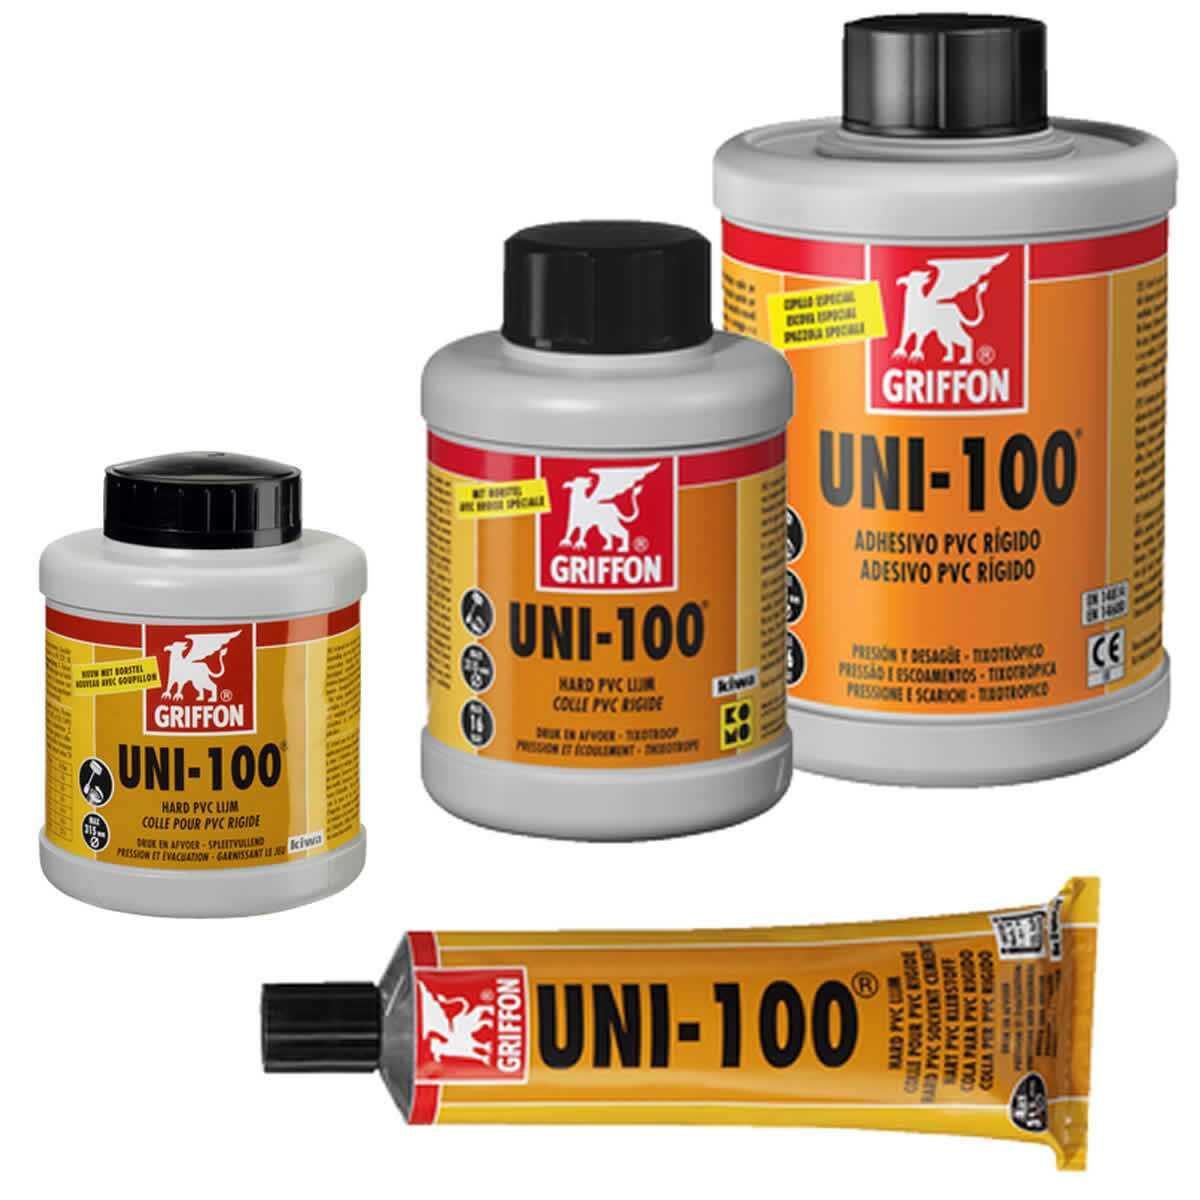 Griffon Uni-100 lepidlo 250g